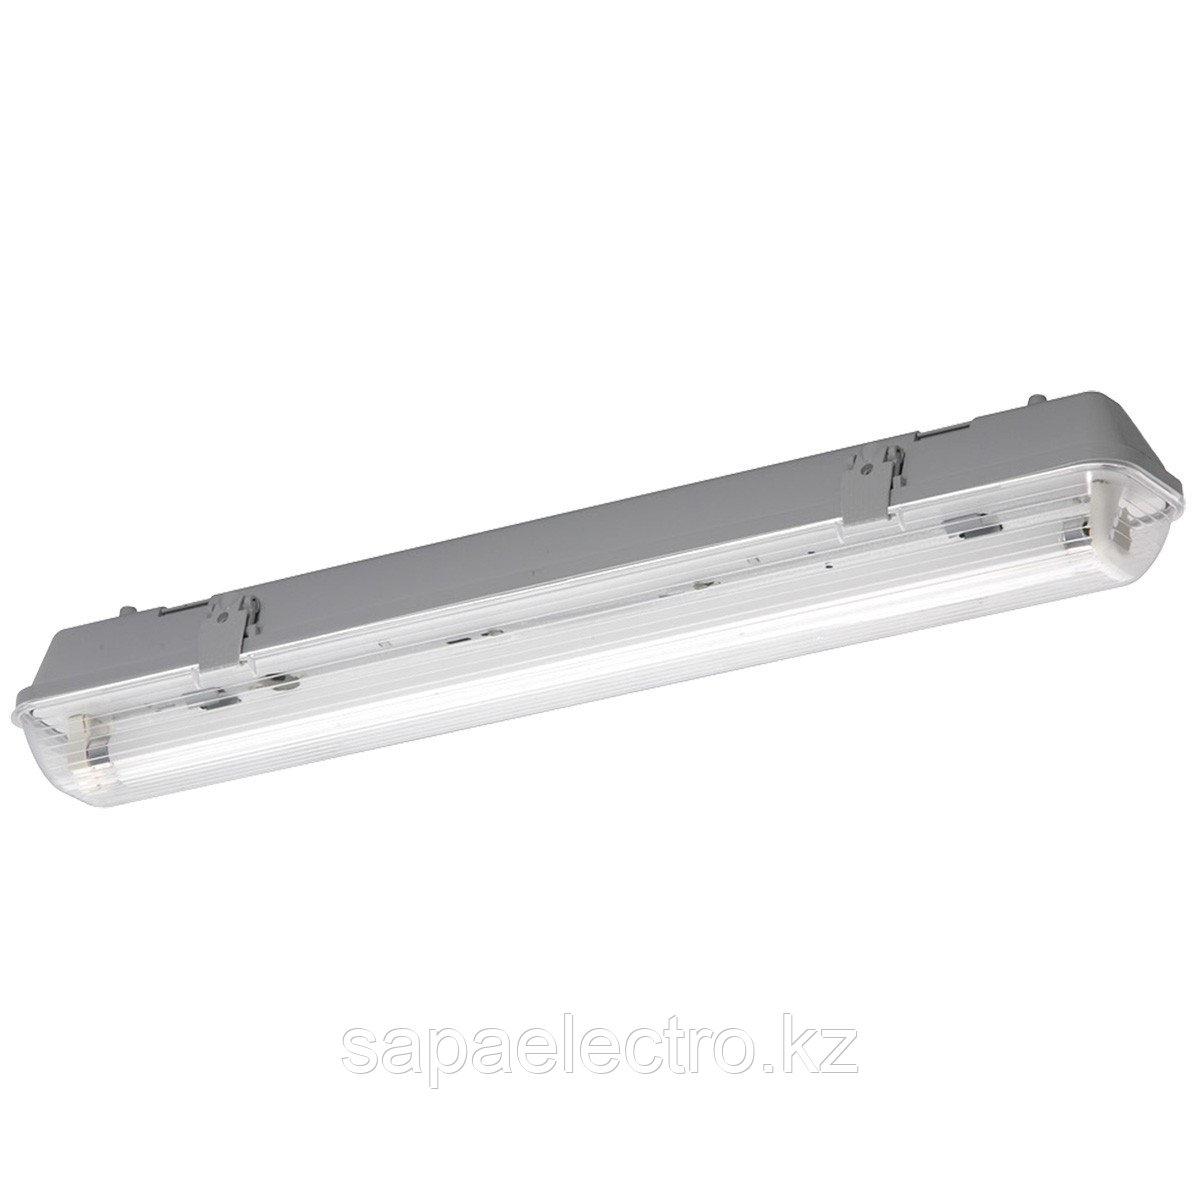 Св-к LEDTUBE LZG 1x18W +лампа (1.20см) MEGALUX